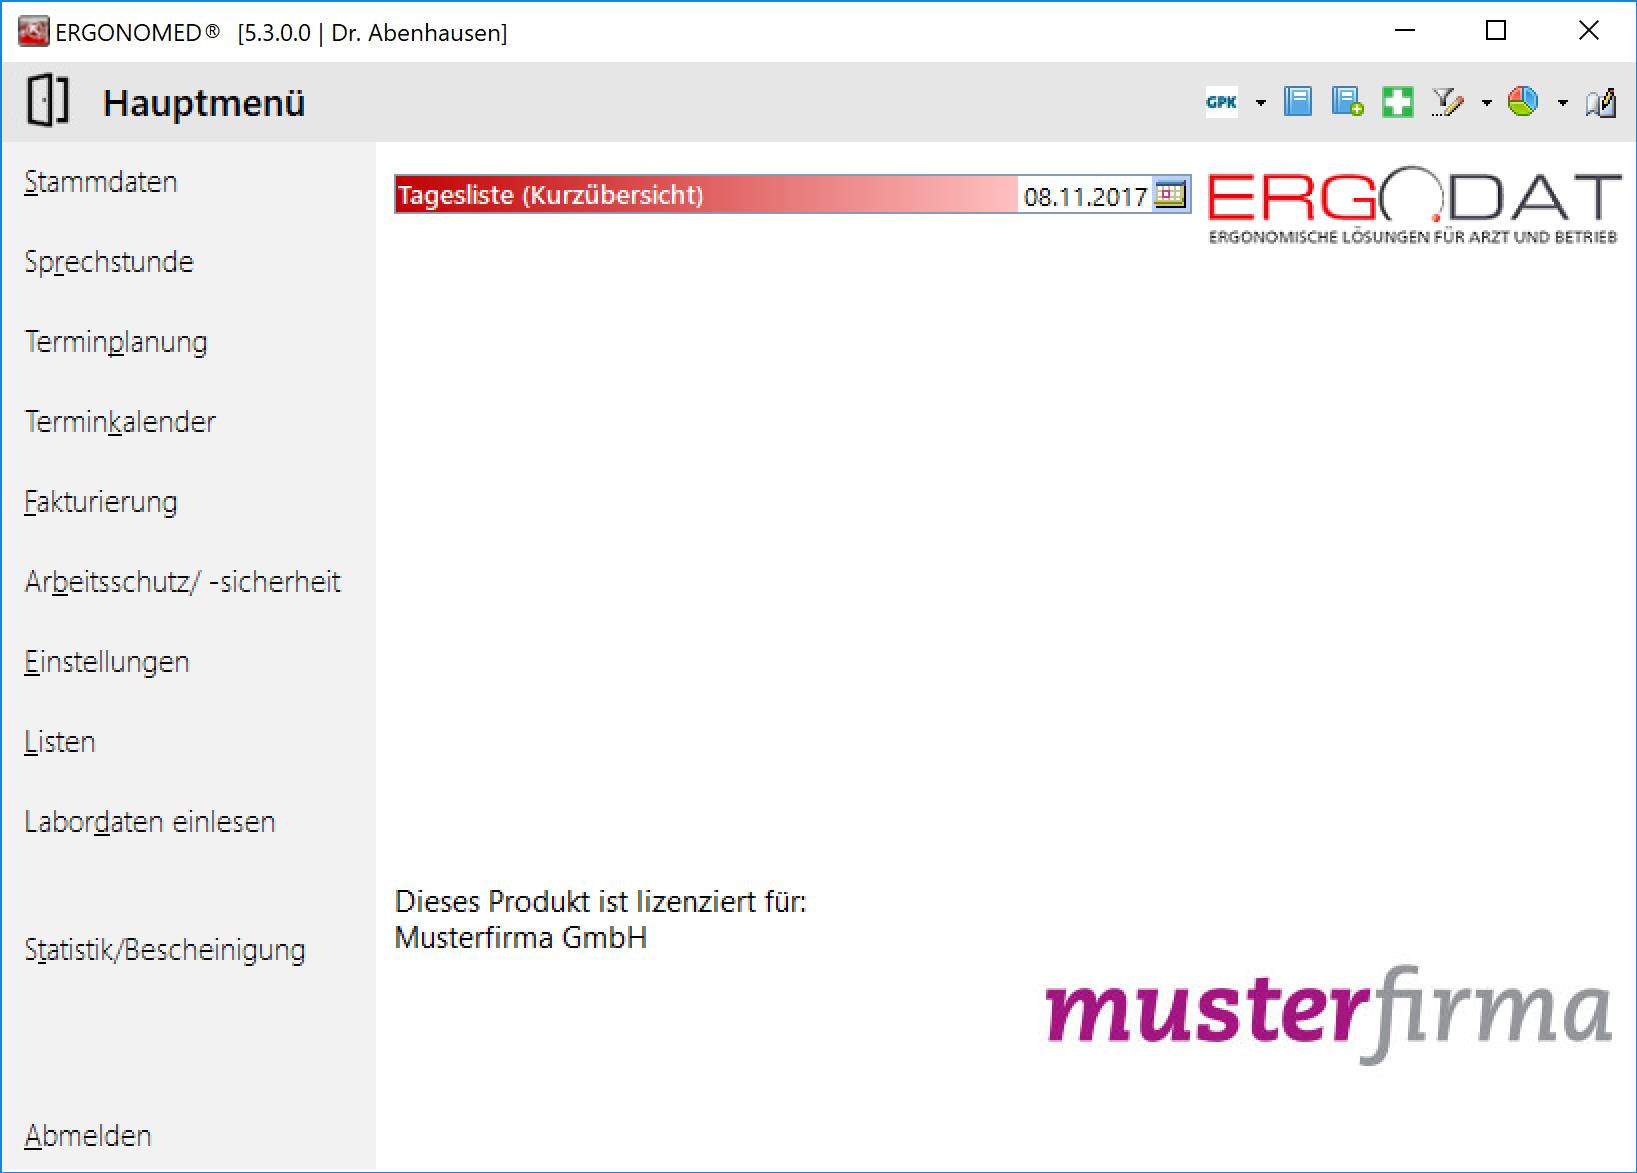 ERGODAT GmbH - ERGONOMED